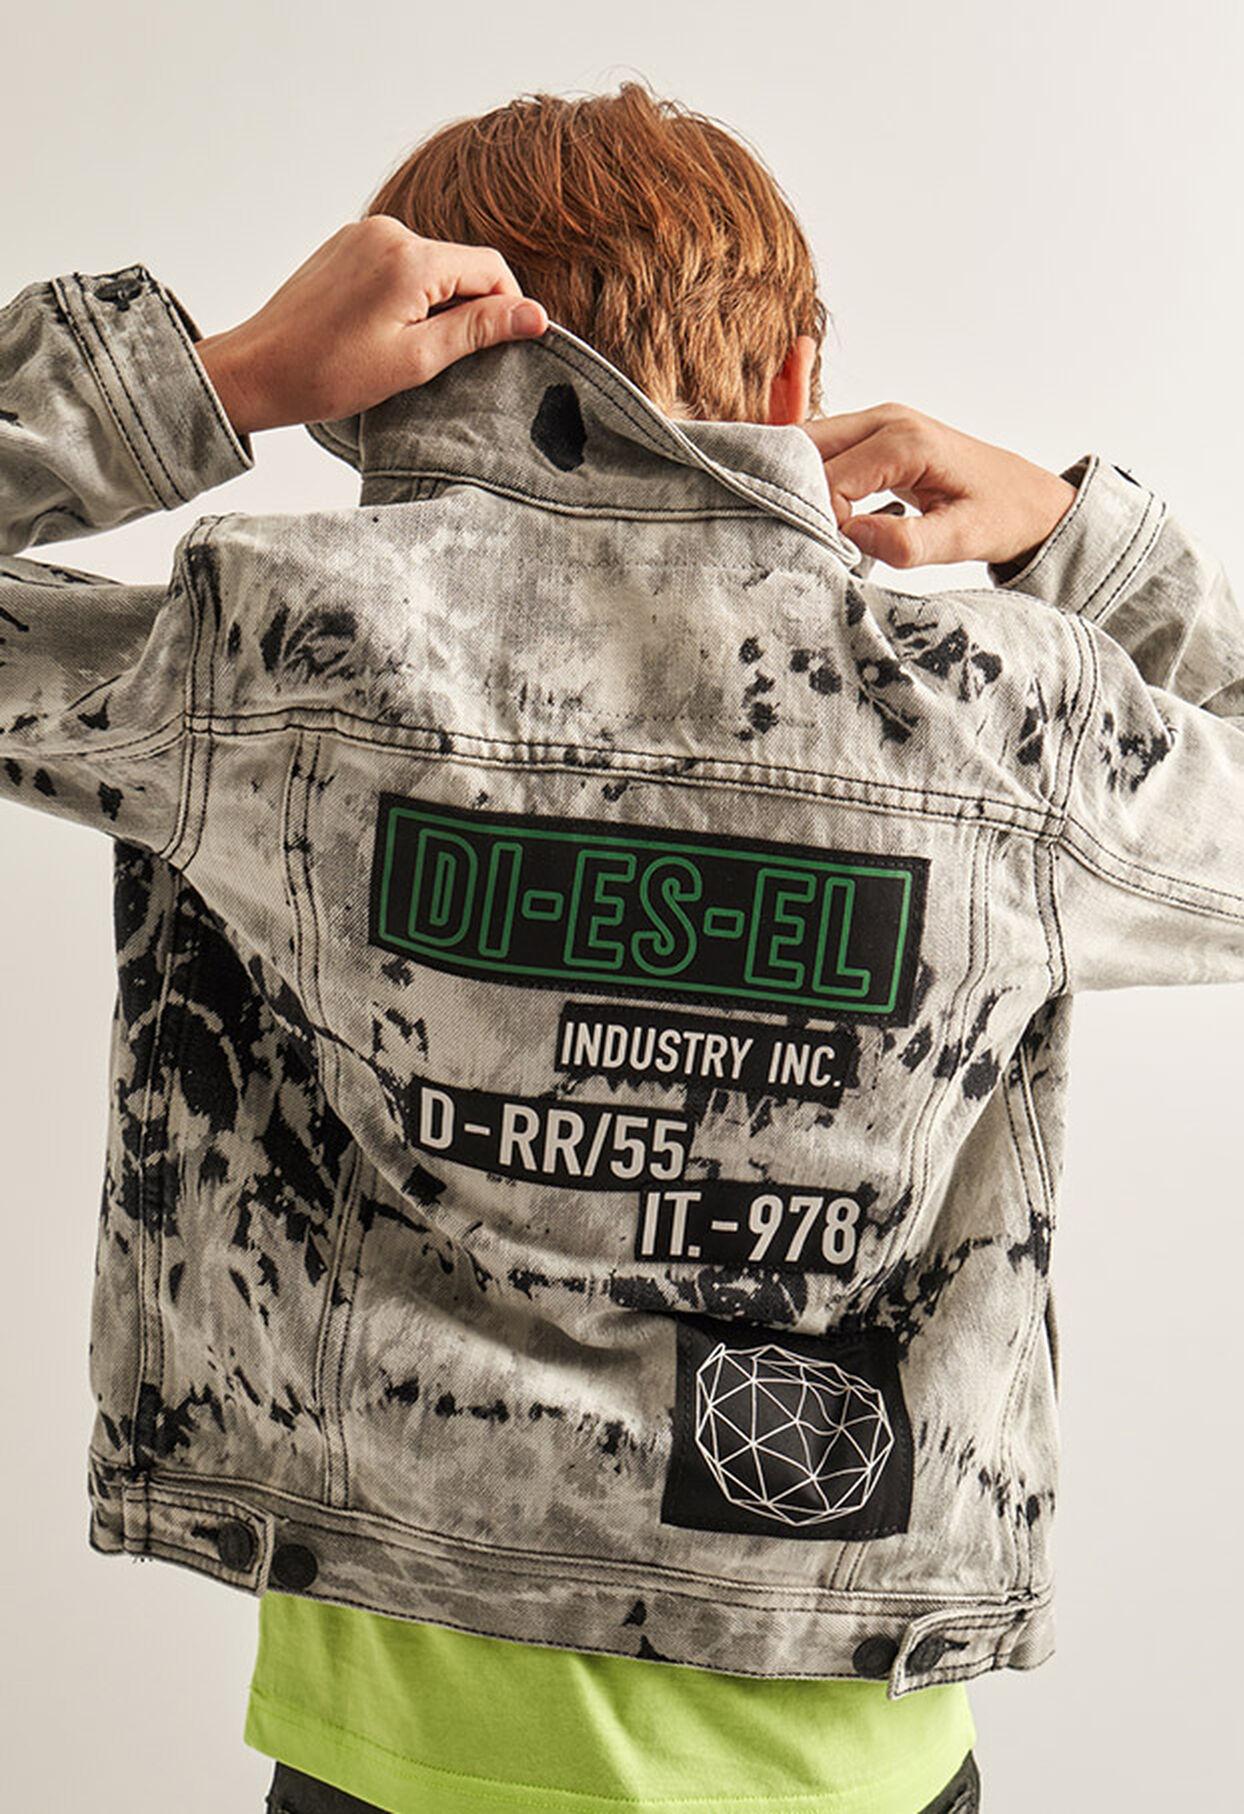 https://si.diesel.com/dw/image/v2/BBLG_PRD/on/demandware.static/-/Library-Sites-DieselMFSharedLibrary/default/dw9fd09078/CATEGORYOV/2x2_90.jpg?sw=1244&sh=1814